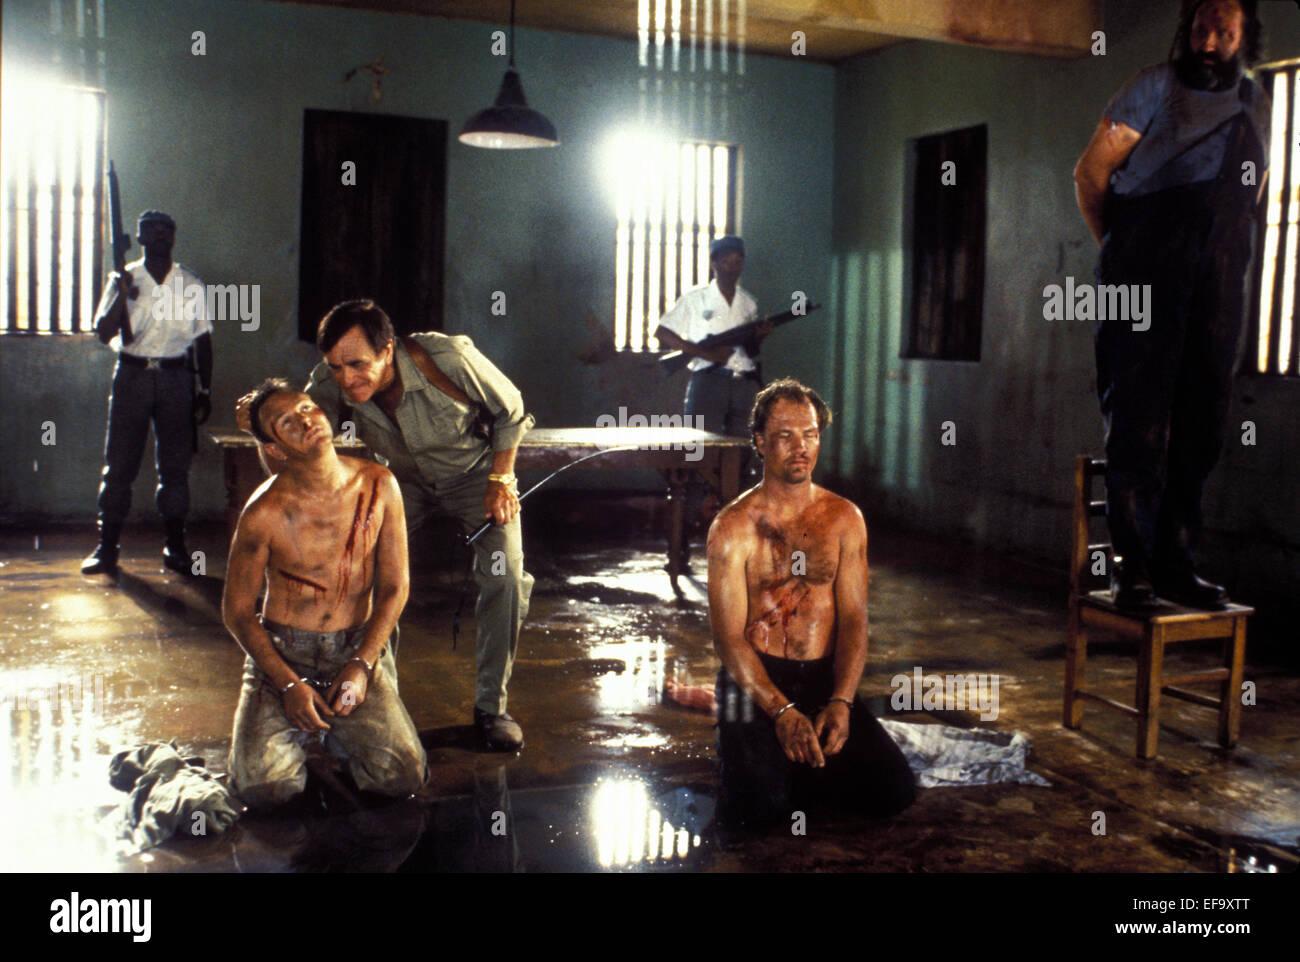 TORTURE SCENE AMERICAN NINJA 4: THE ANNIHILATION (1990) - Stock Image